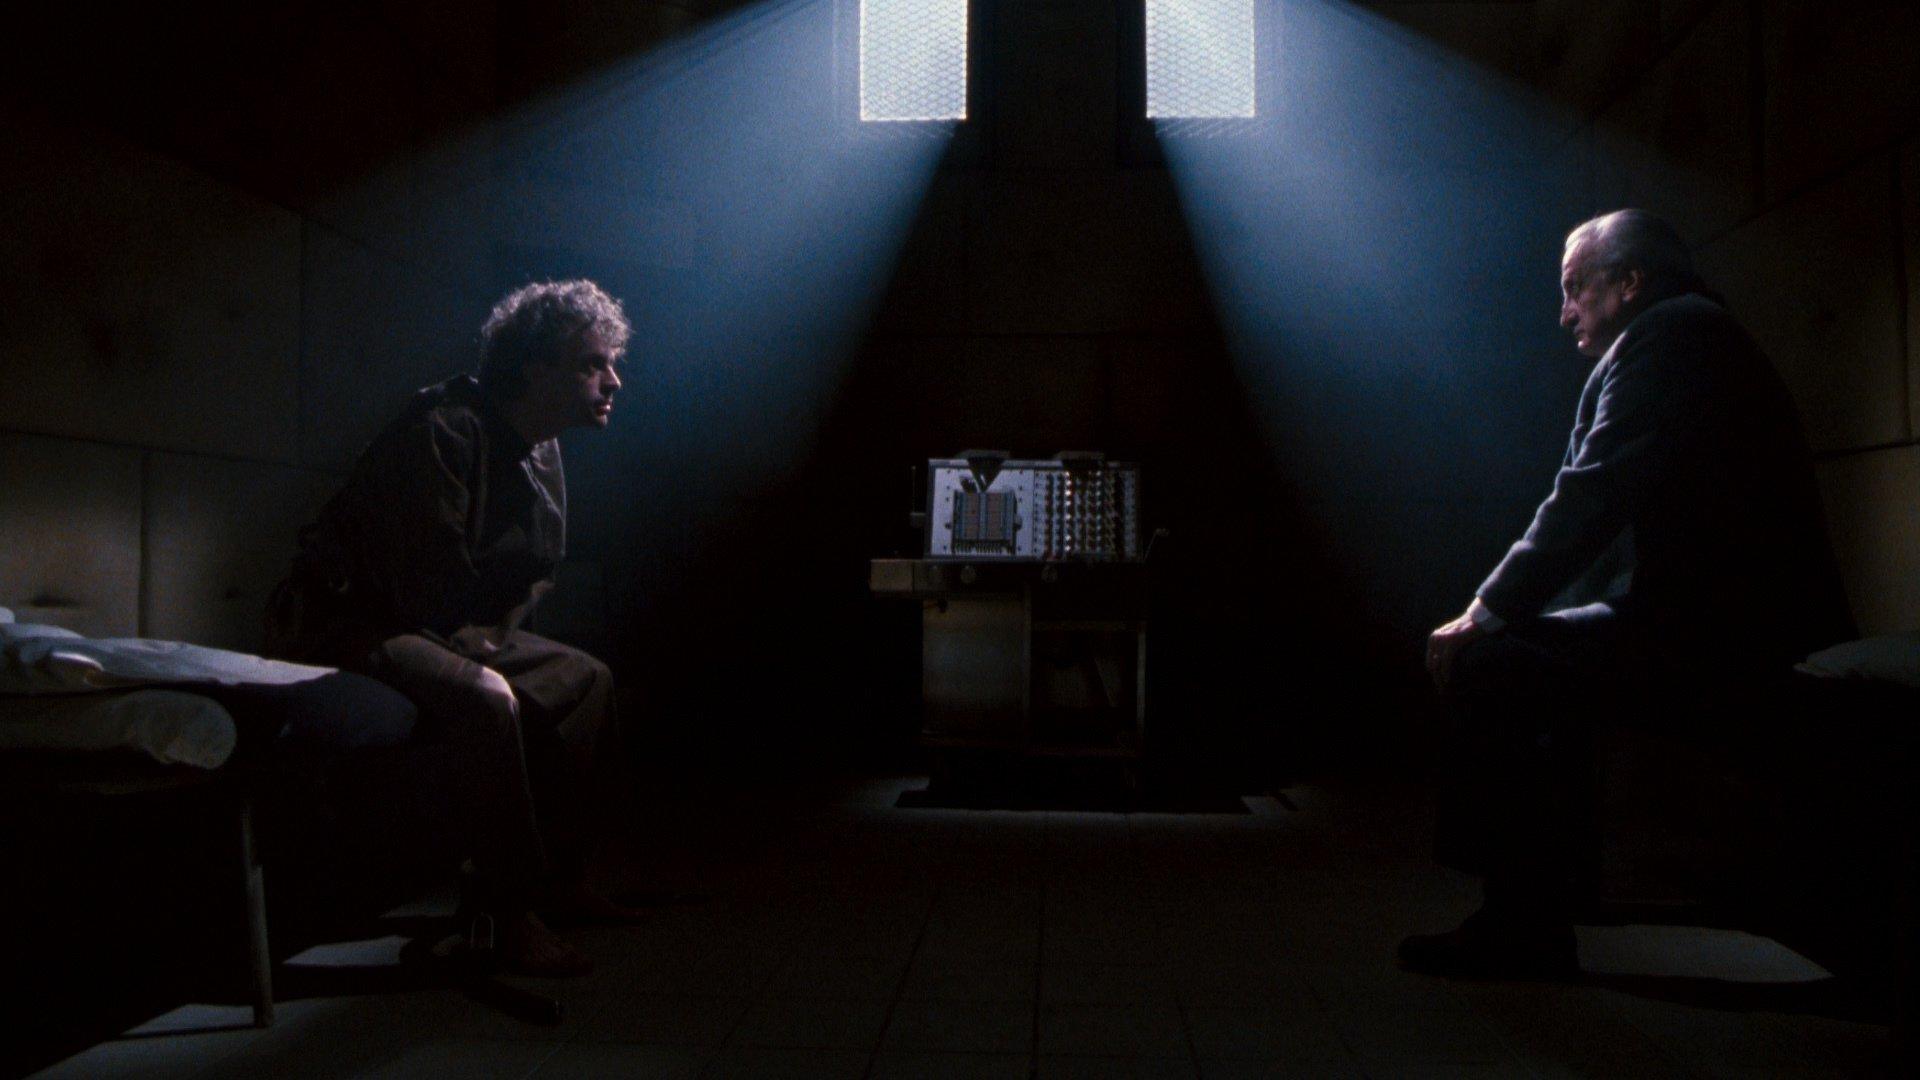 The Exorcist III backdrop